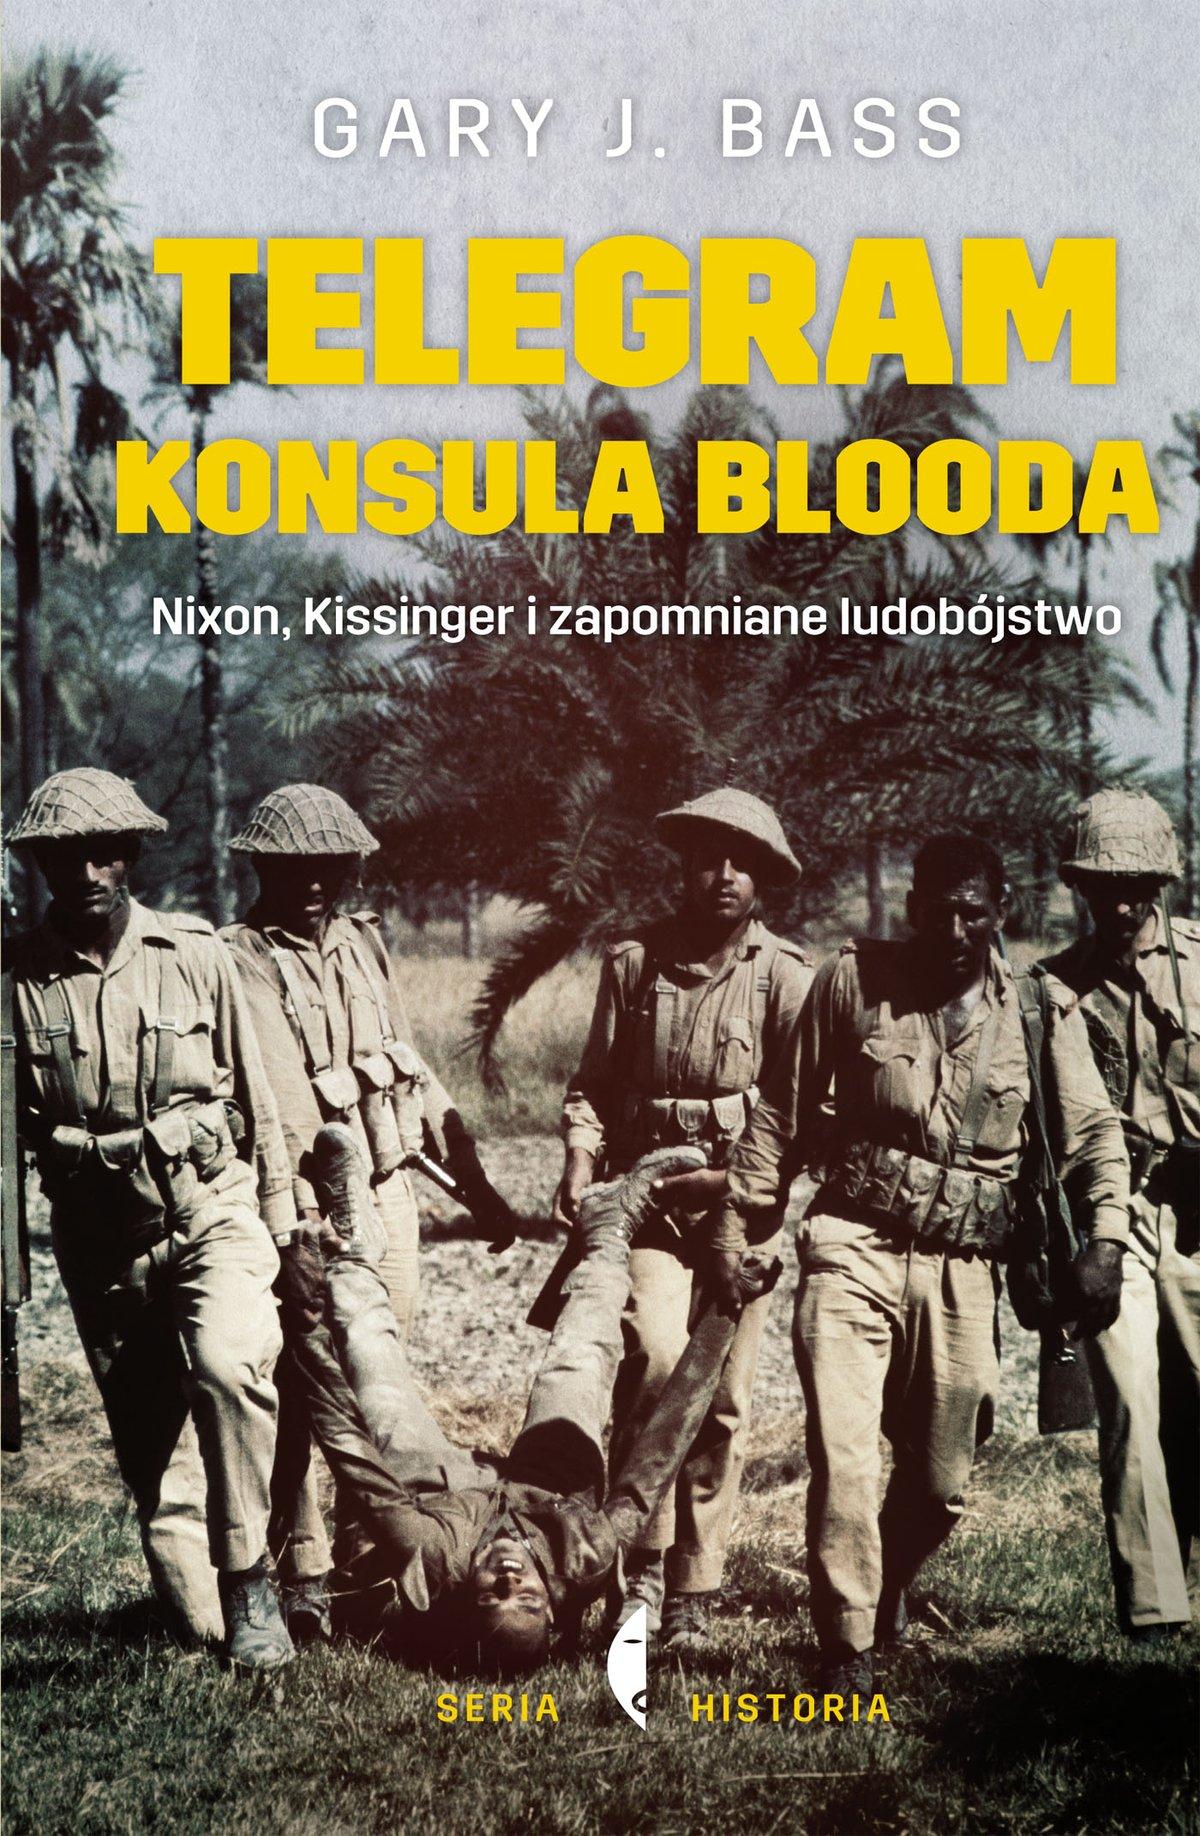 Telegram konsula Blooda - Ebook (Książka na Kindle) do pobrania w formacie MOBI